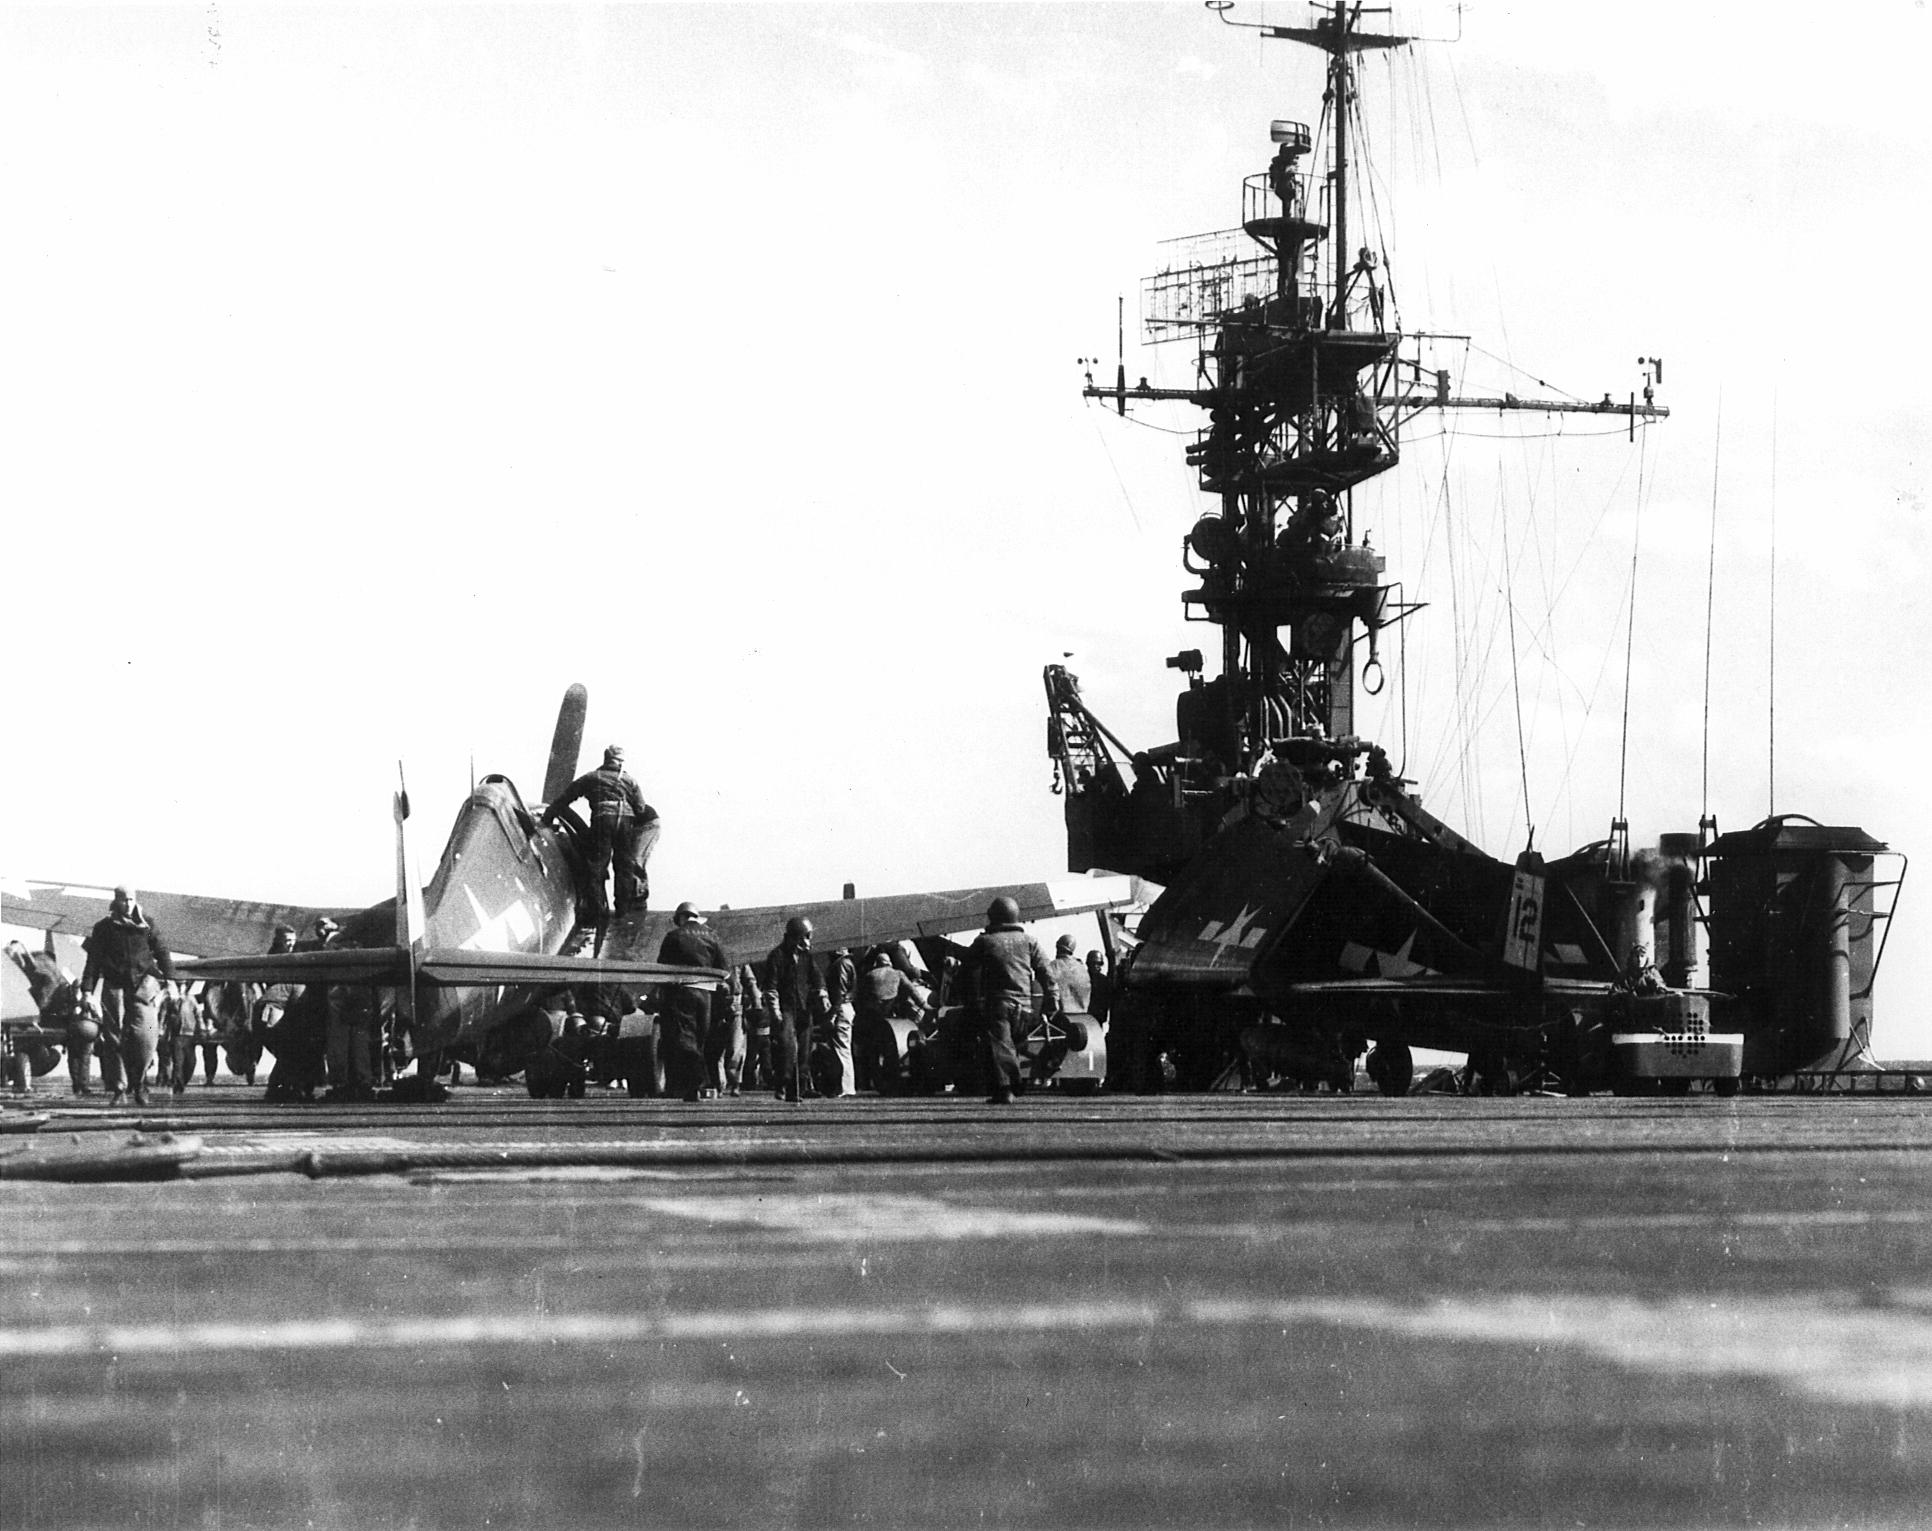 Grumman F6F 5 Hellcat VF 42 Black 12 aboard CVL 30 USS San Jacinto 01